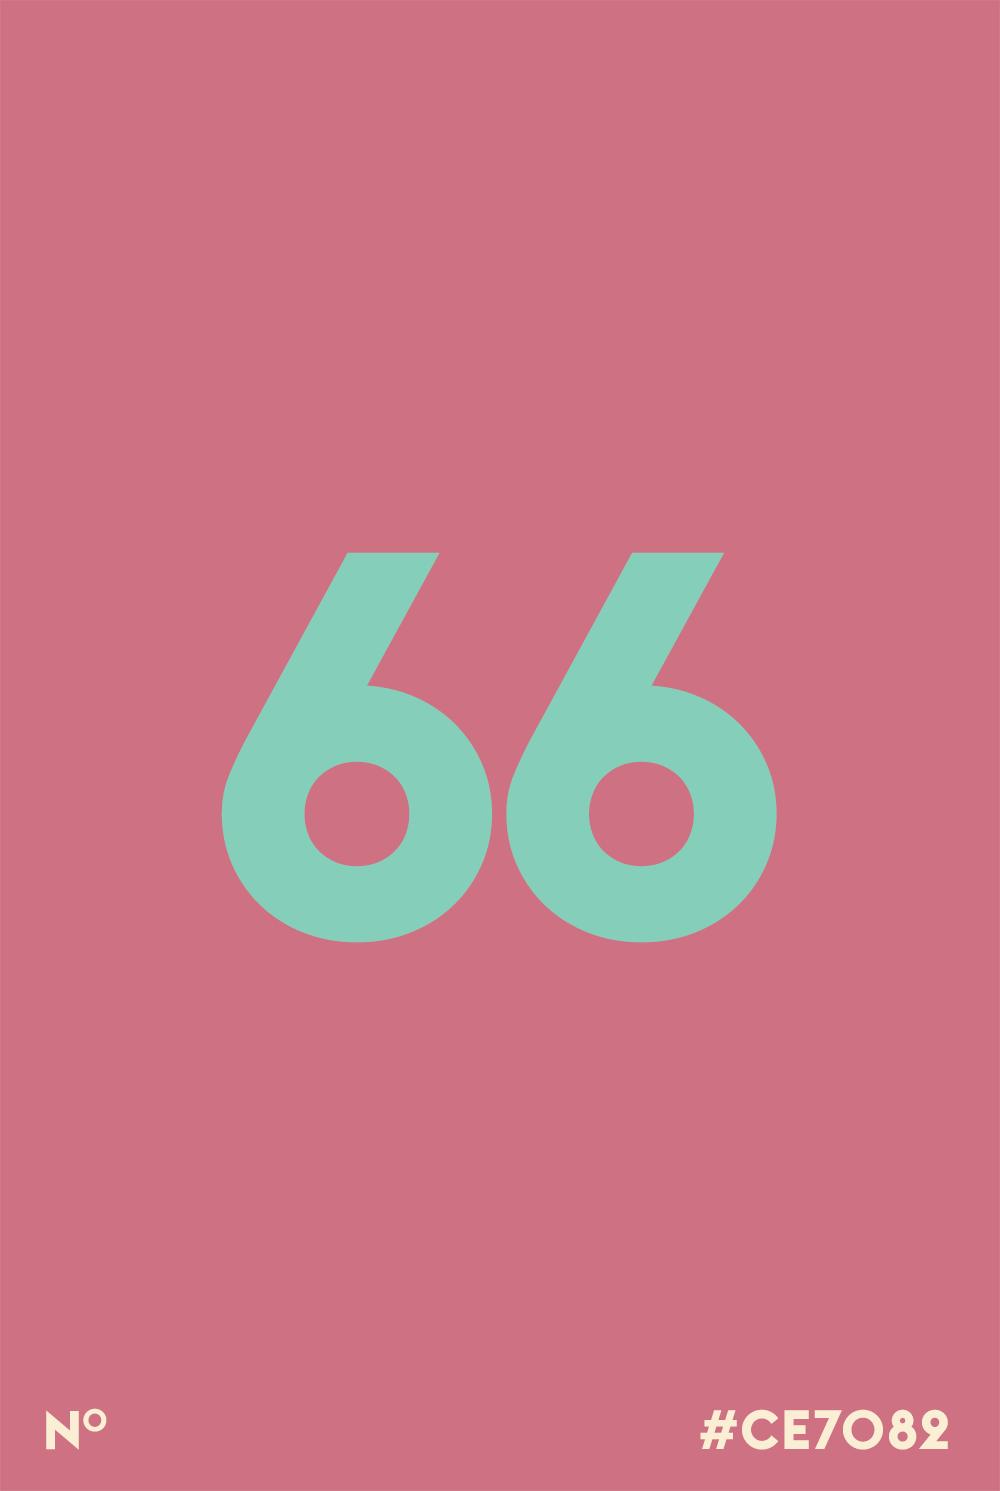 cc_0064_66